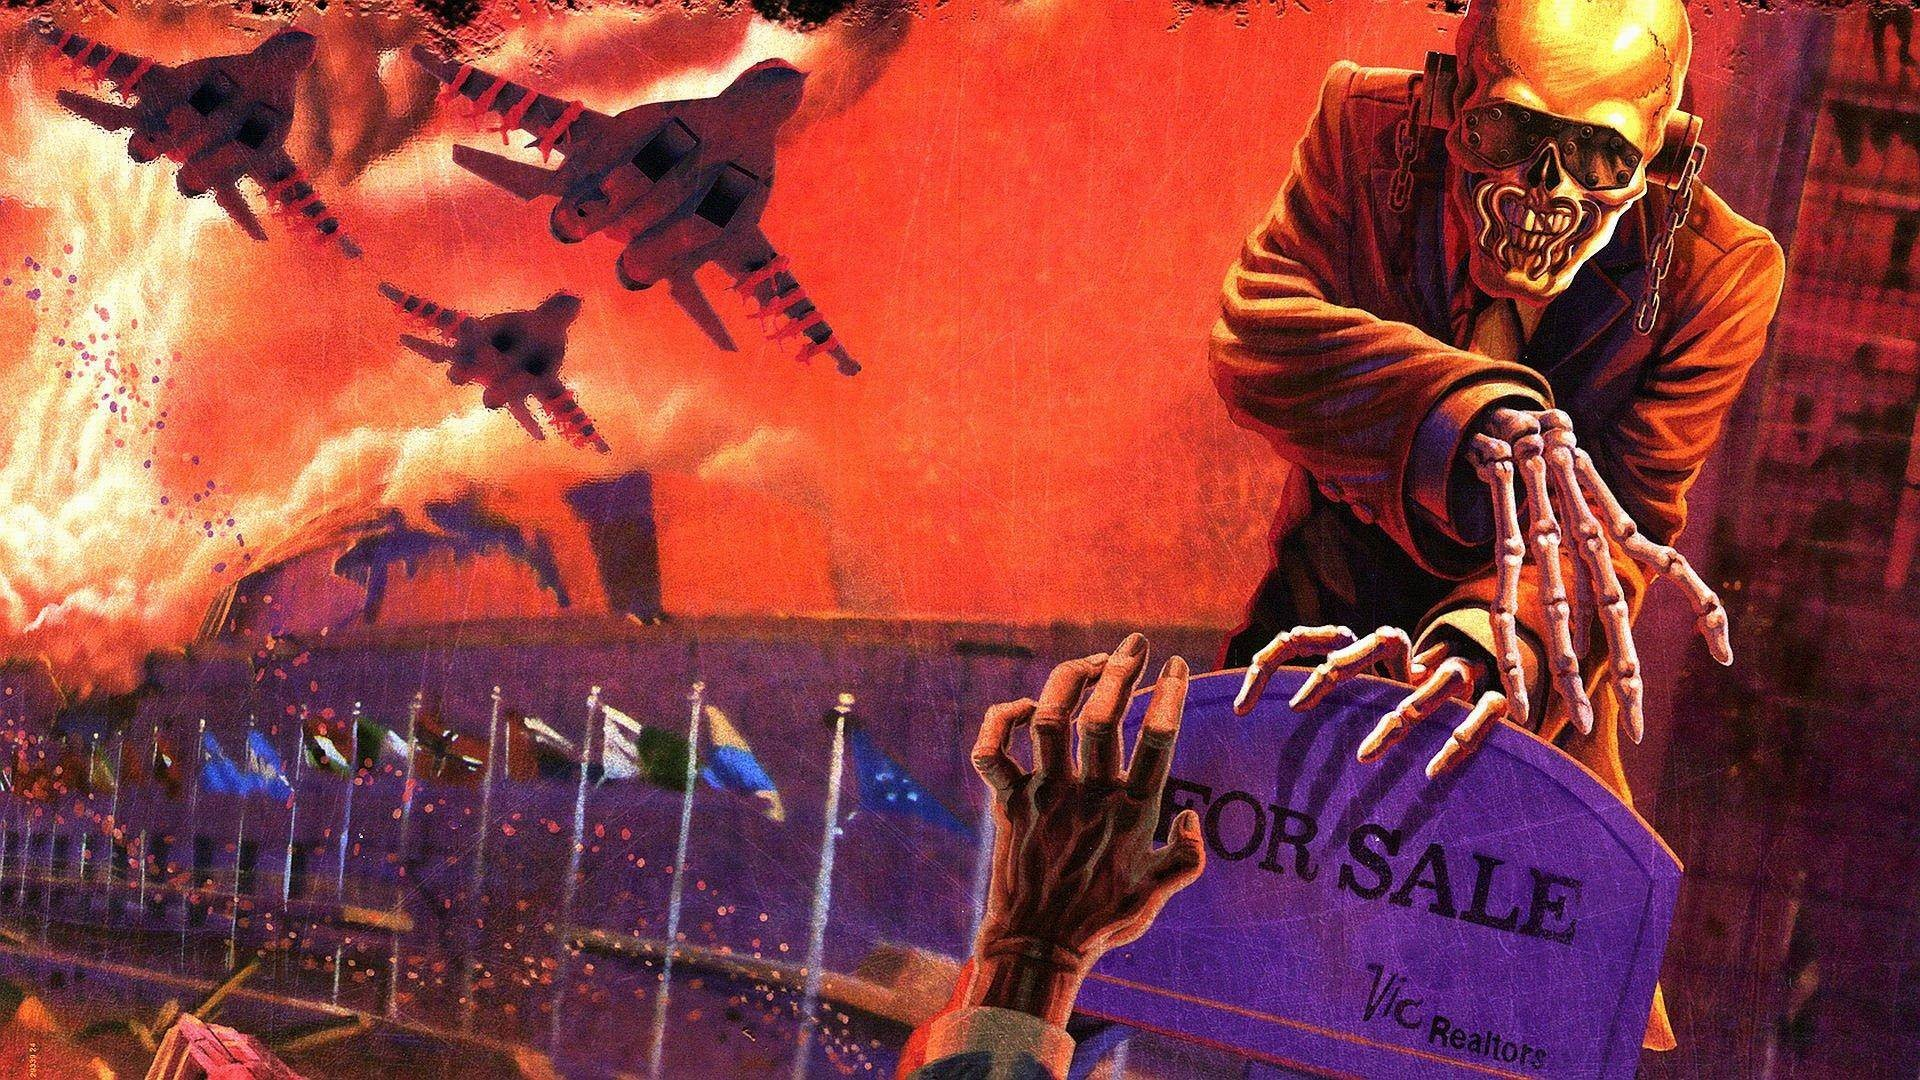 Full HD p Megadeth Wallpapers HD, Desktop Backgrounds 1920×1080 Megadeth  Wallpapers   Adorable